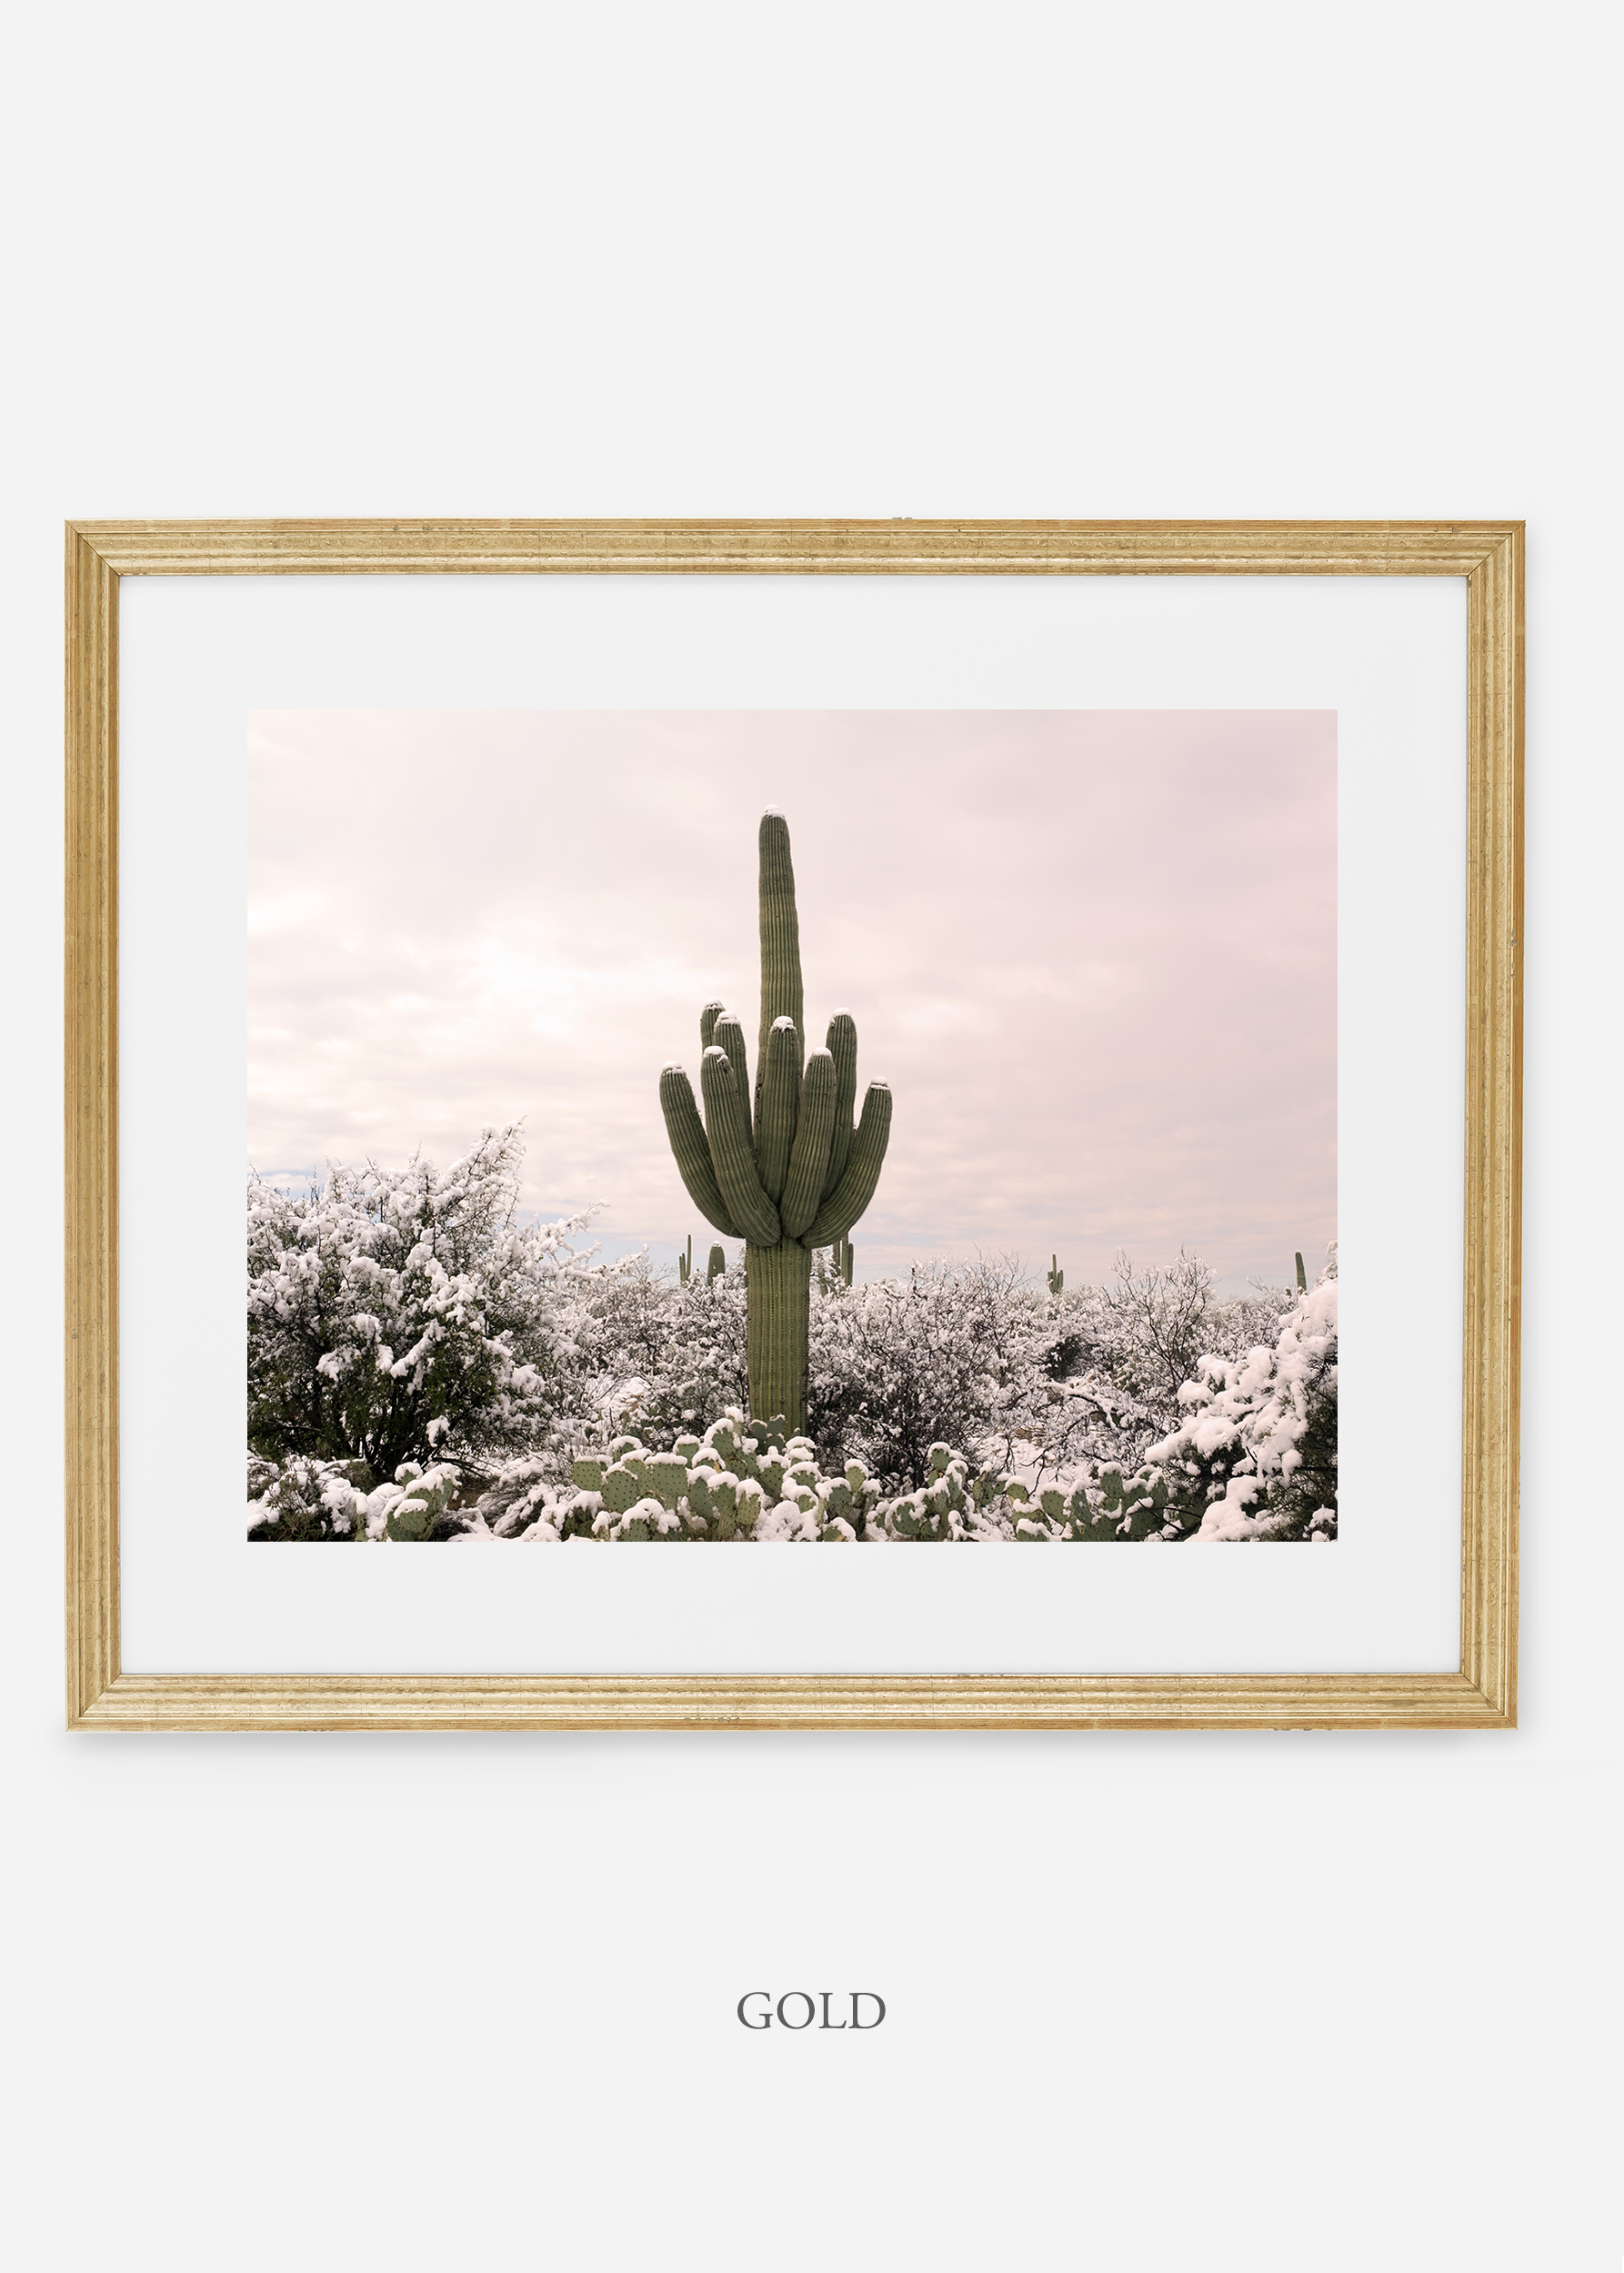 goldframe-saguaroNo.3-wildercalifornia-art-wallart-cactusprint-homedecor-prints-arizona-botanical-artwork-interiordesign.jpg